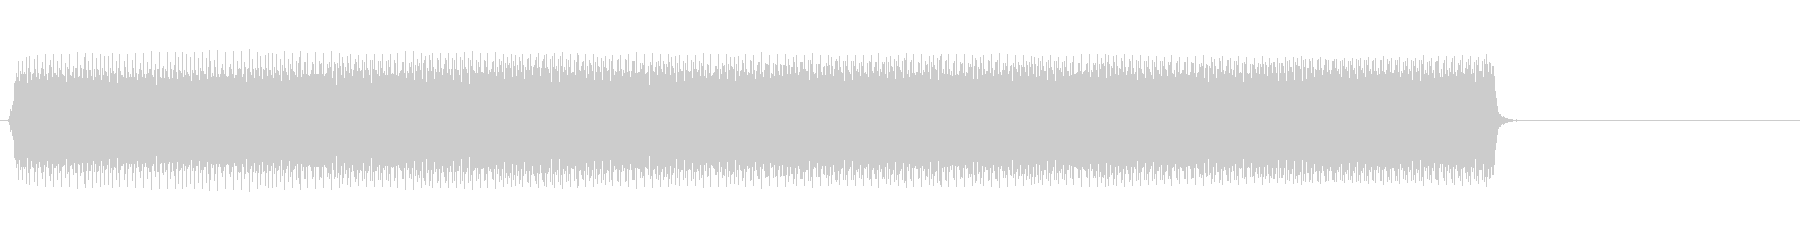 EXT:ホーン、ロングブラスト、ク...の未再生の波形